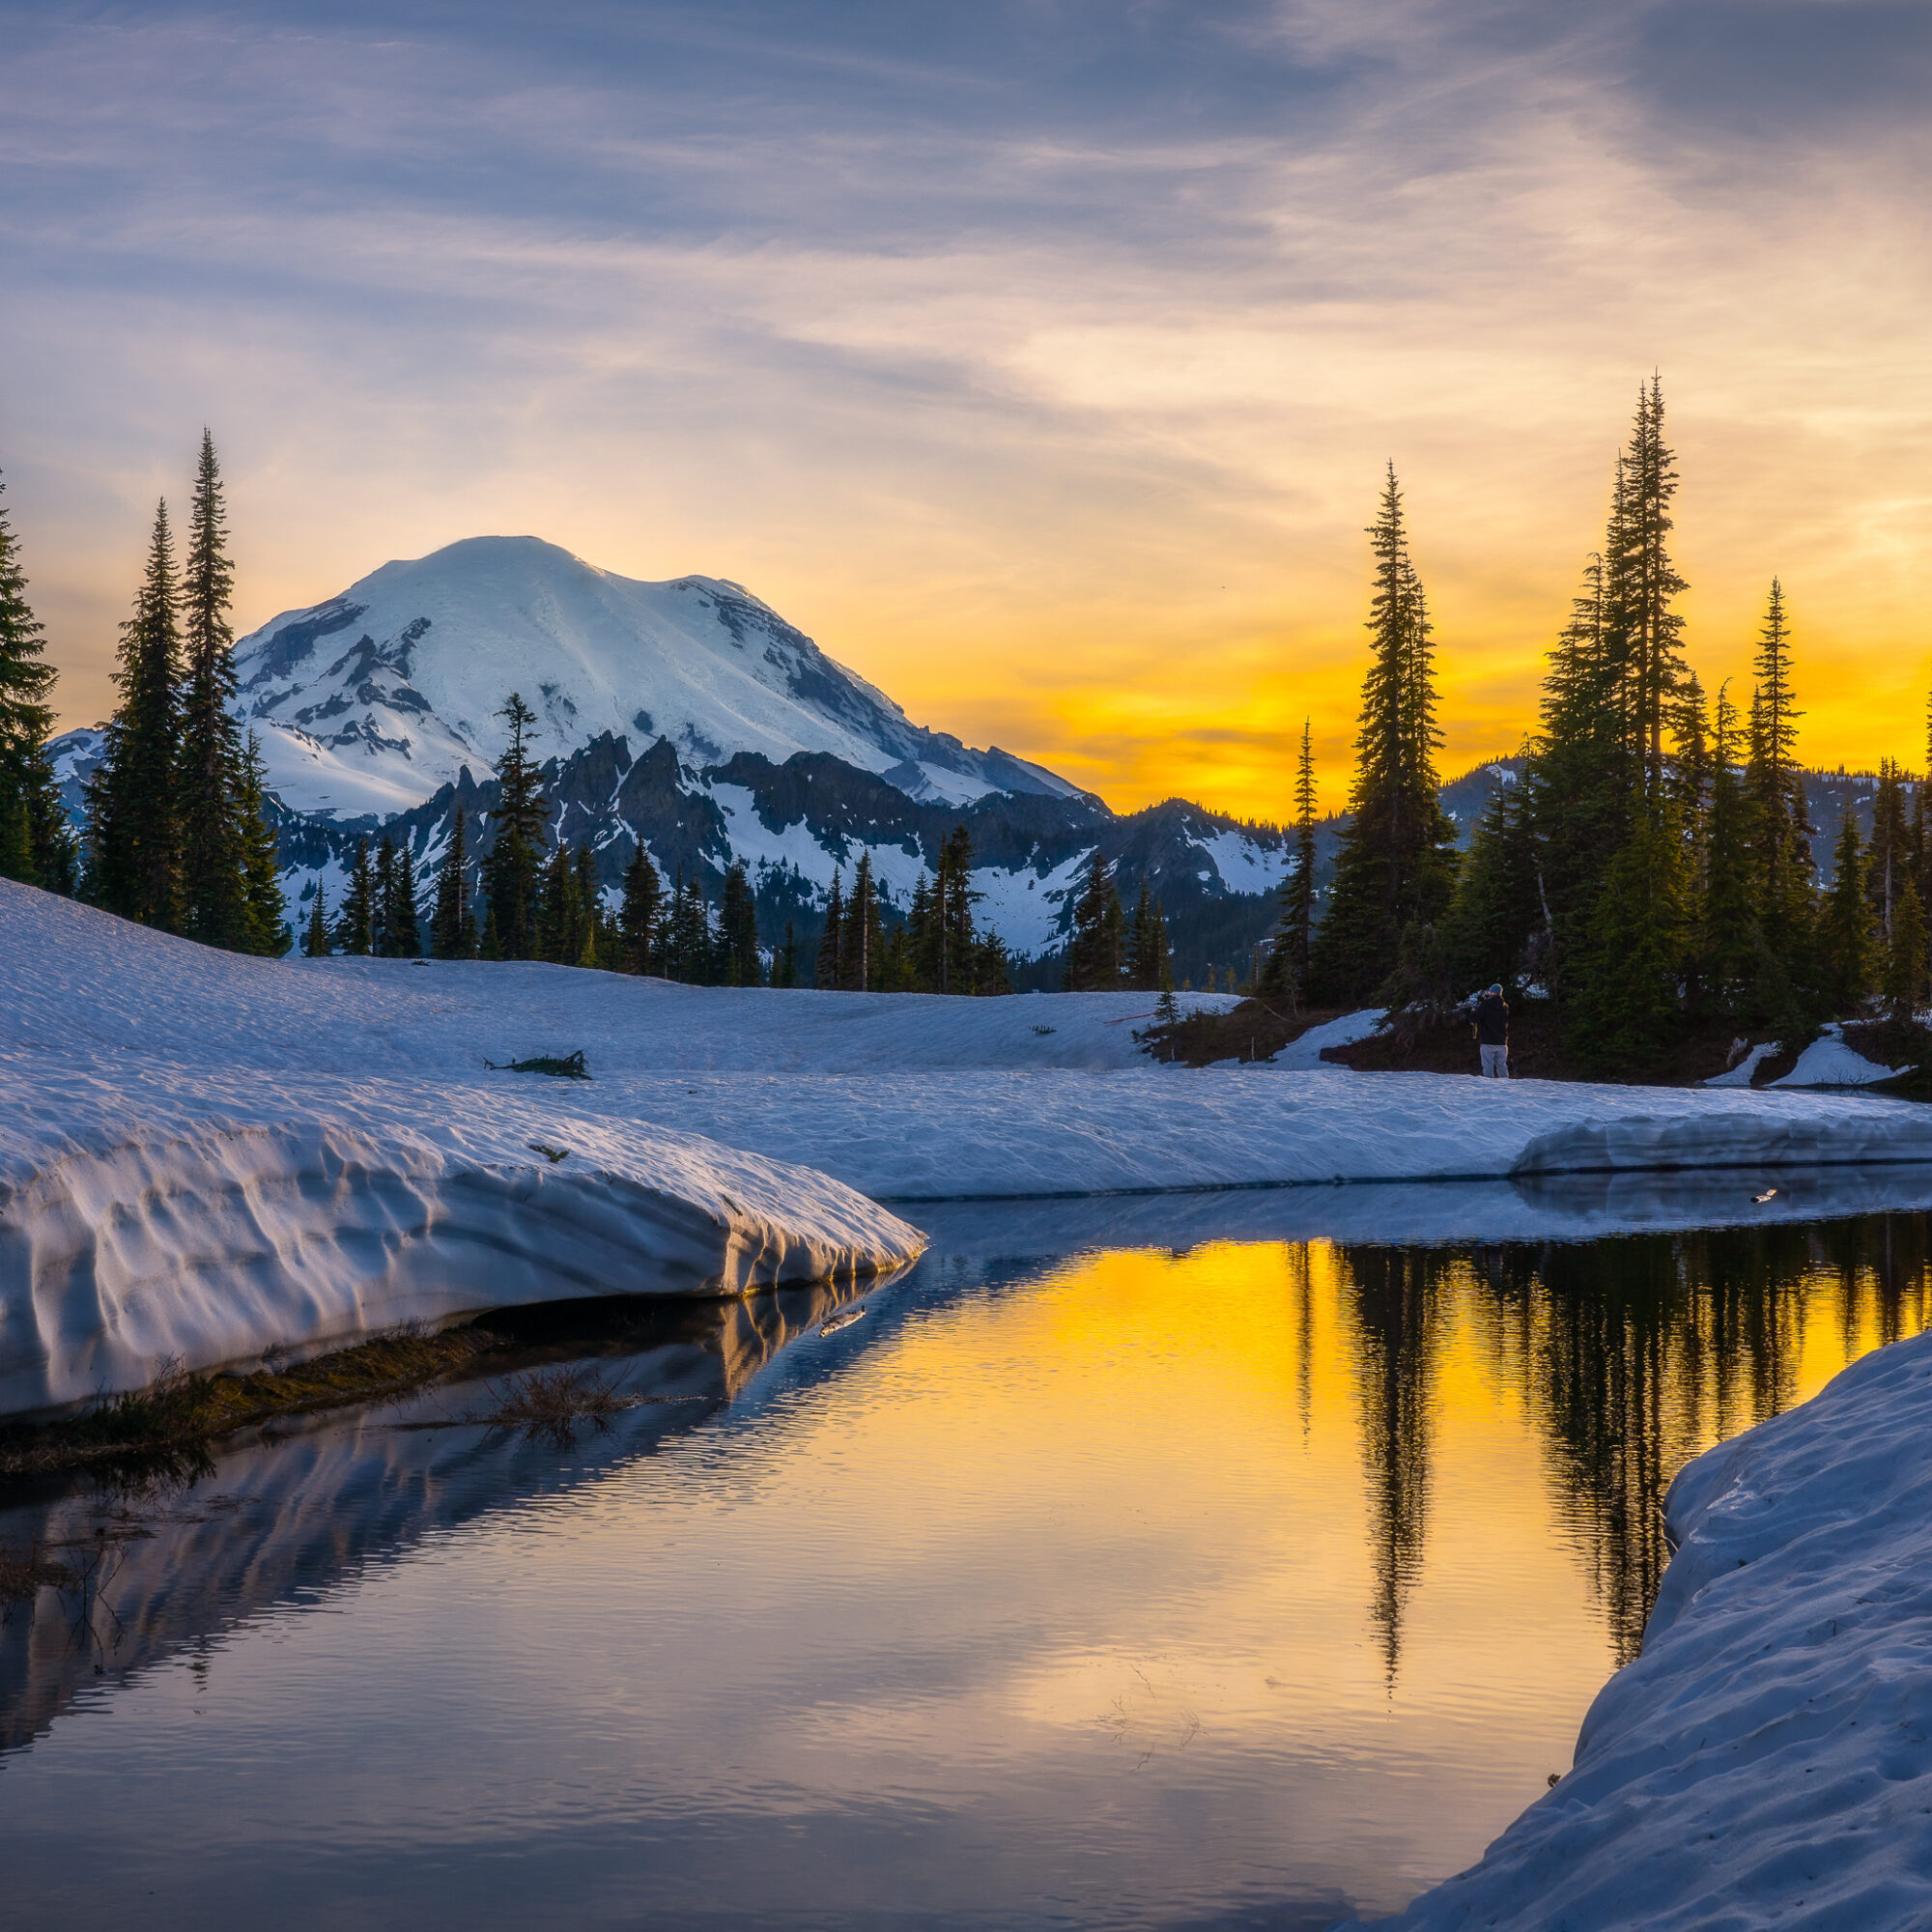 Mount Rainier National Park during winter time.